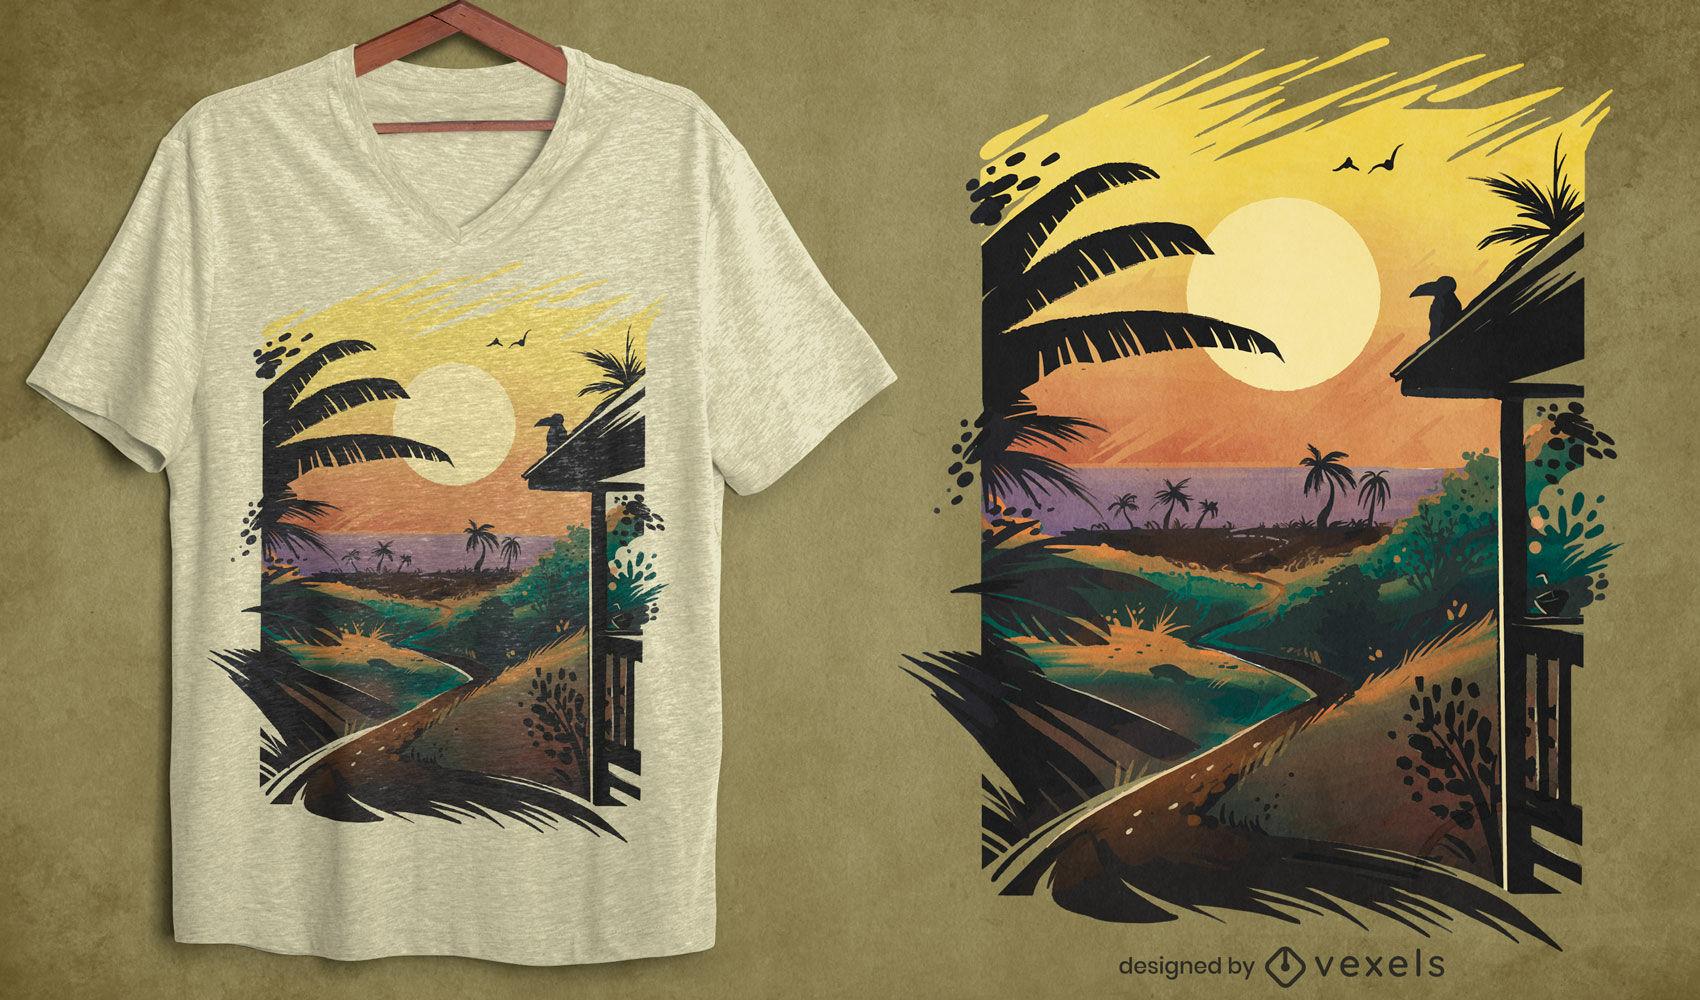 Dise?o de camiseta psd de paisaje de playa tropical puesta de sol